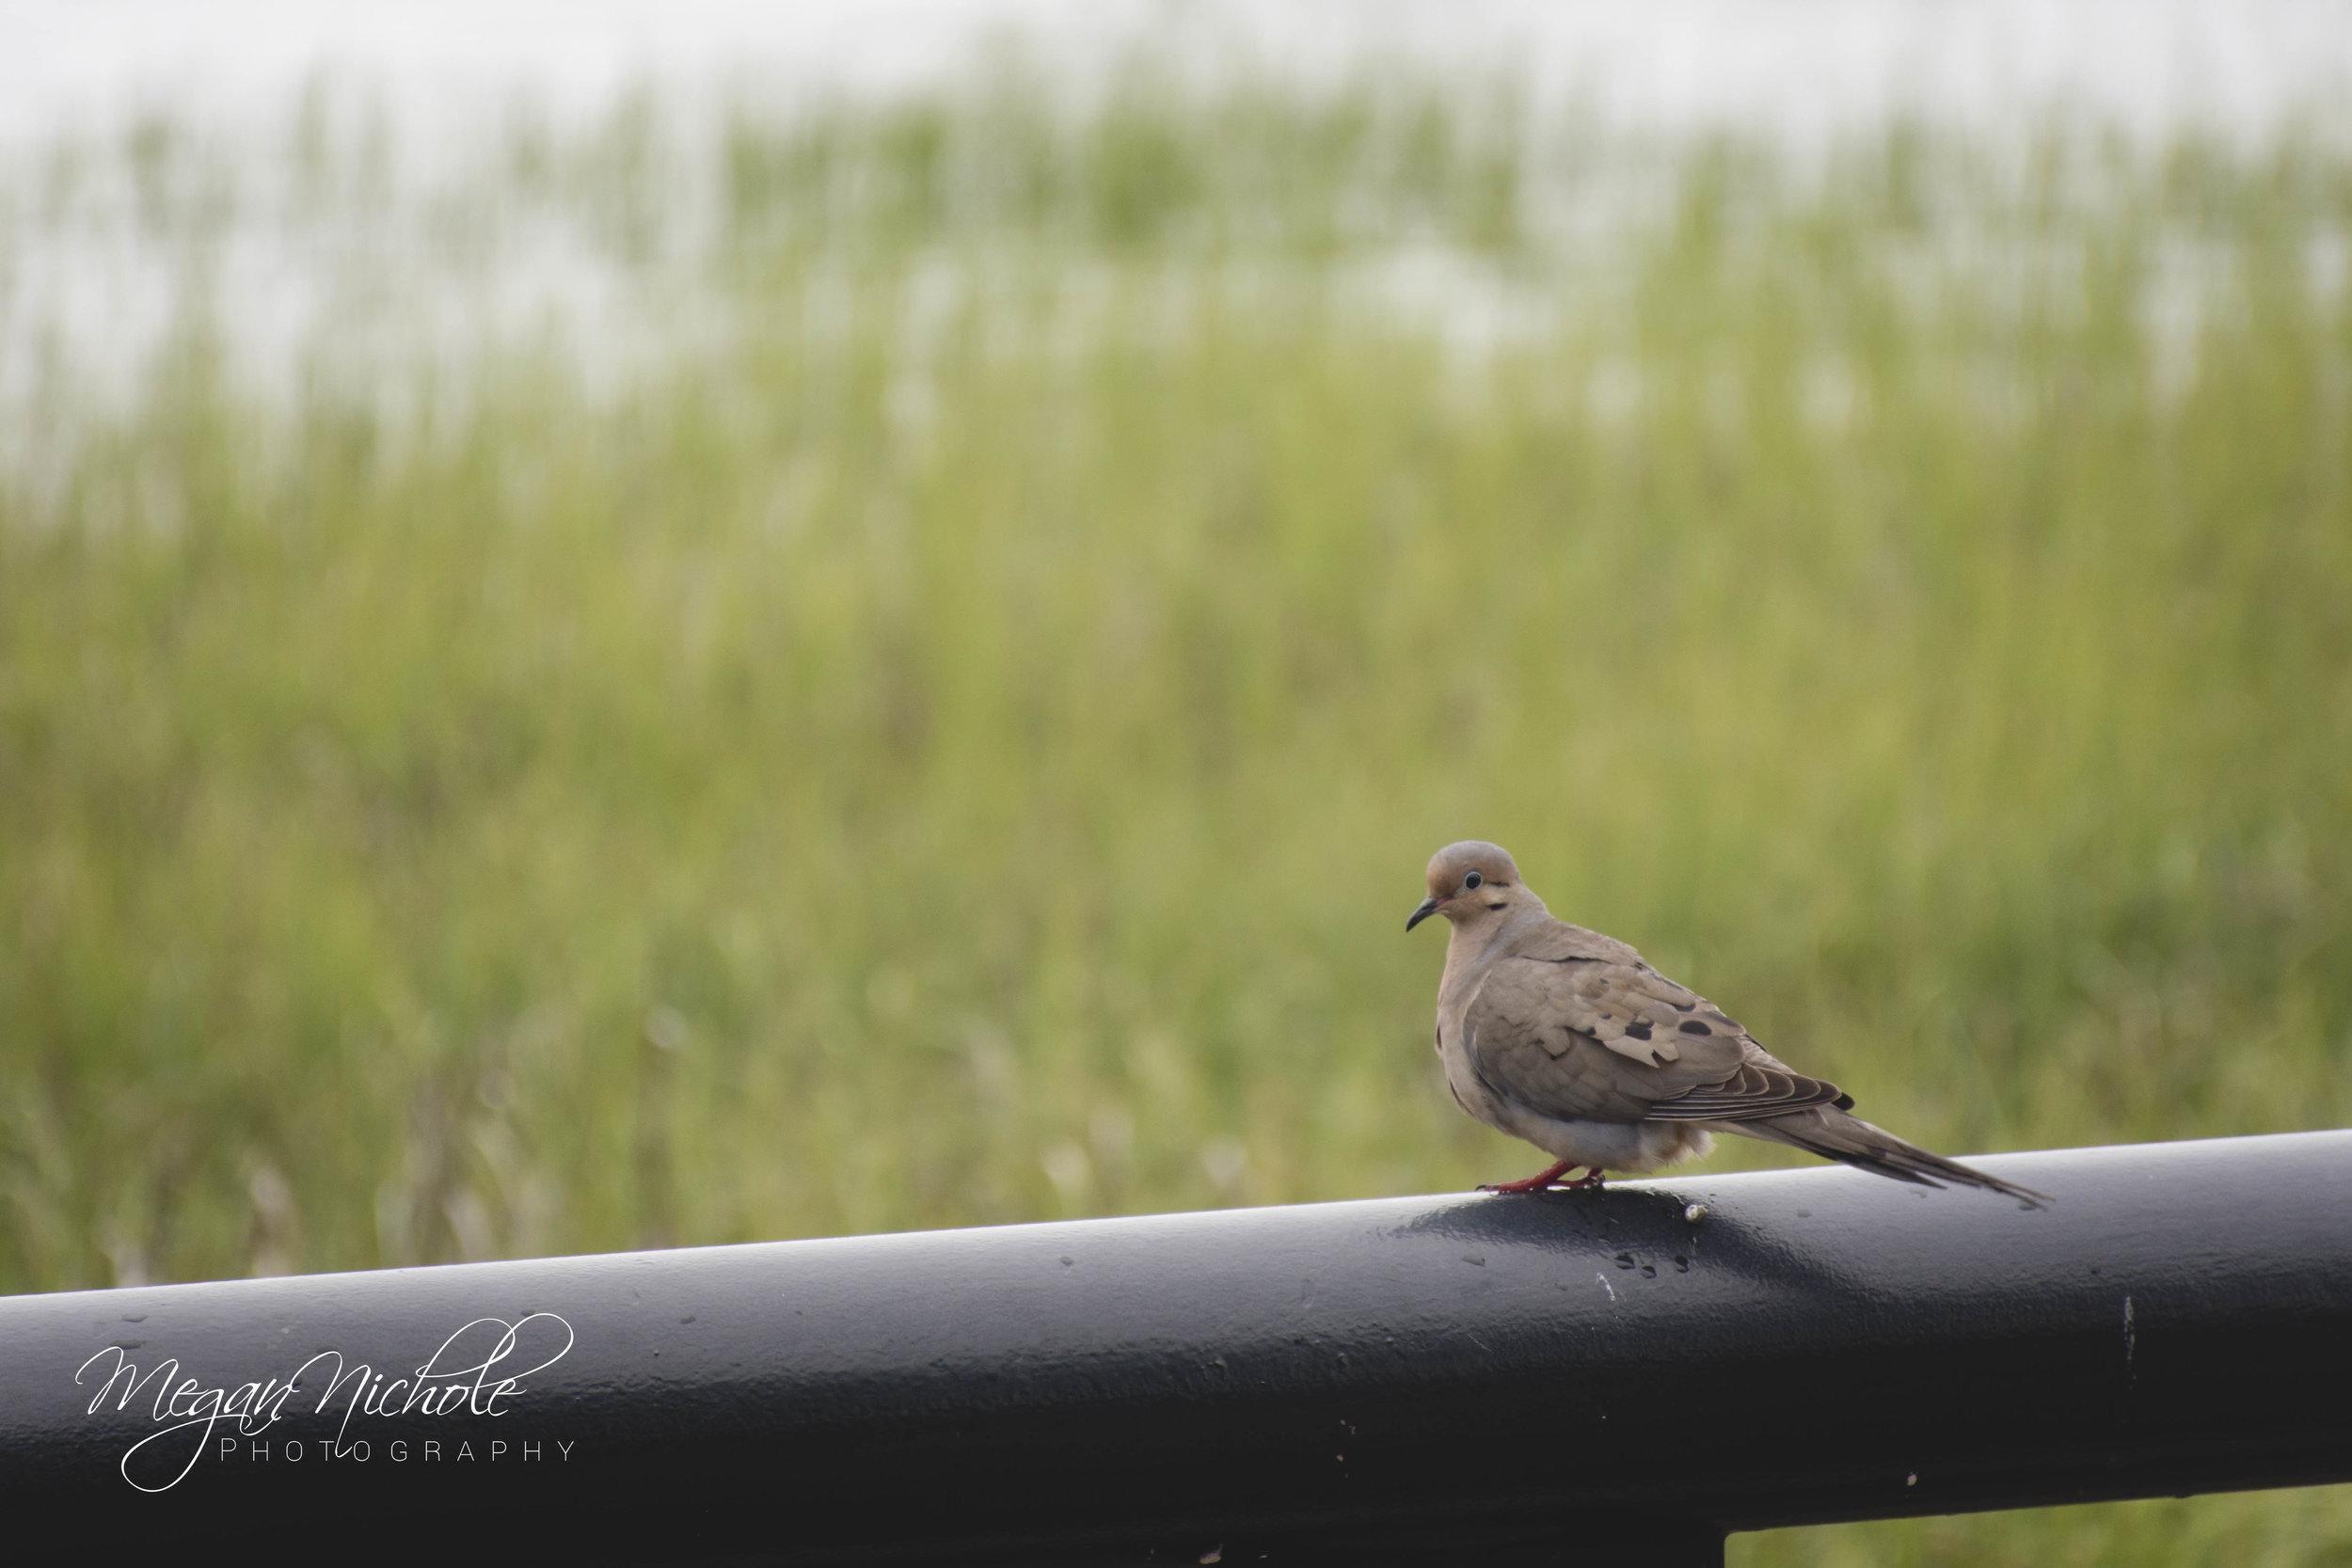 Charleston, South Carolina waterfront park bird